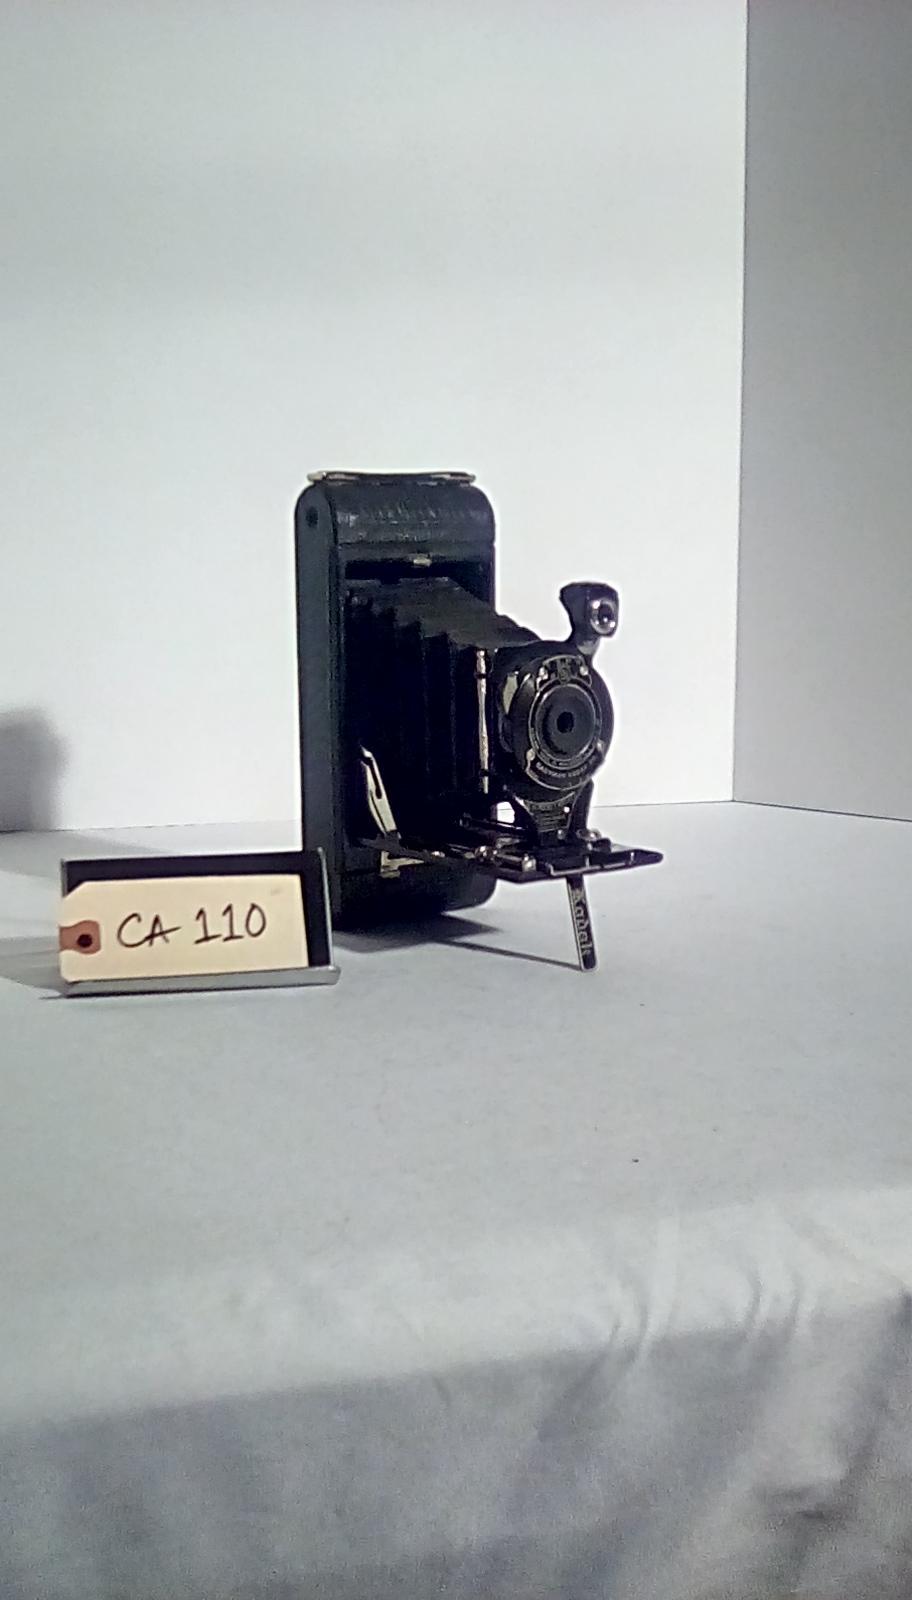 CA110, Eastman Kodak, hawkeye, #14, accordion fold, 1926-1934